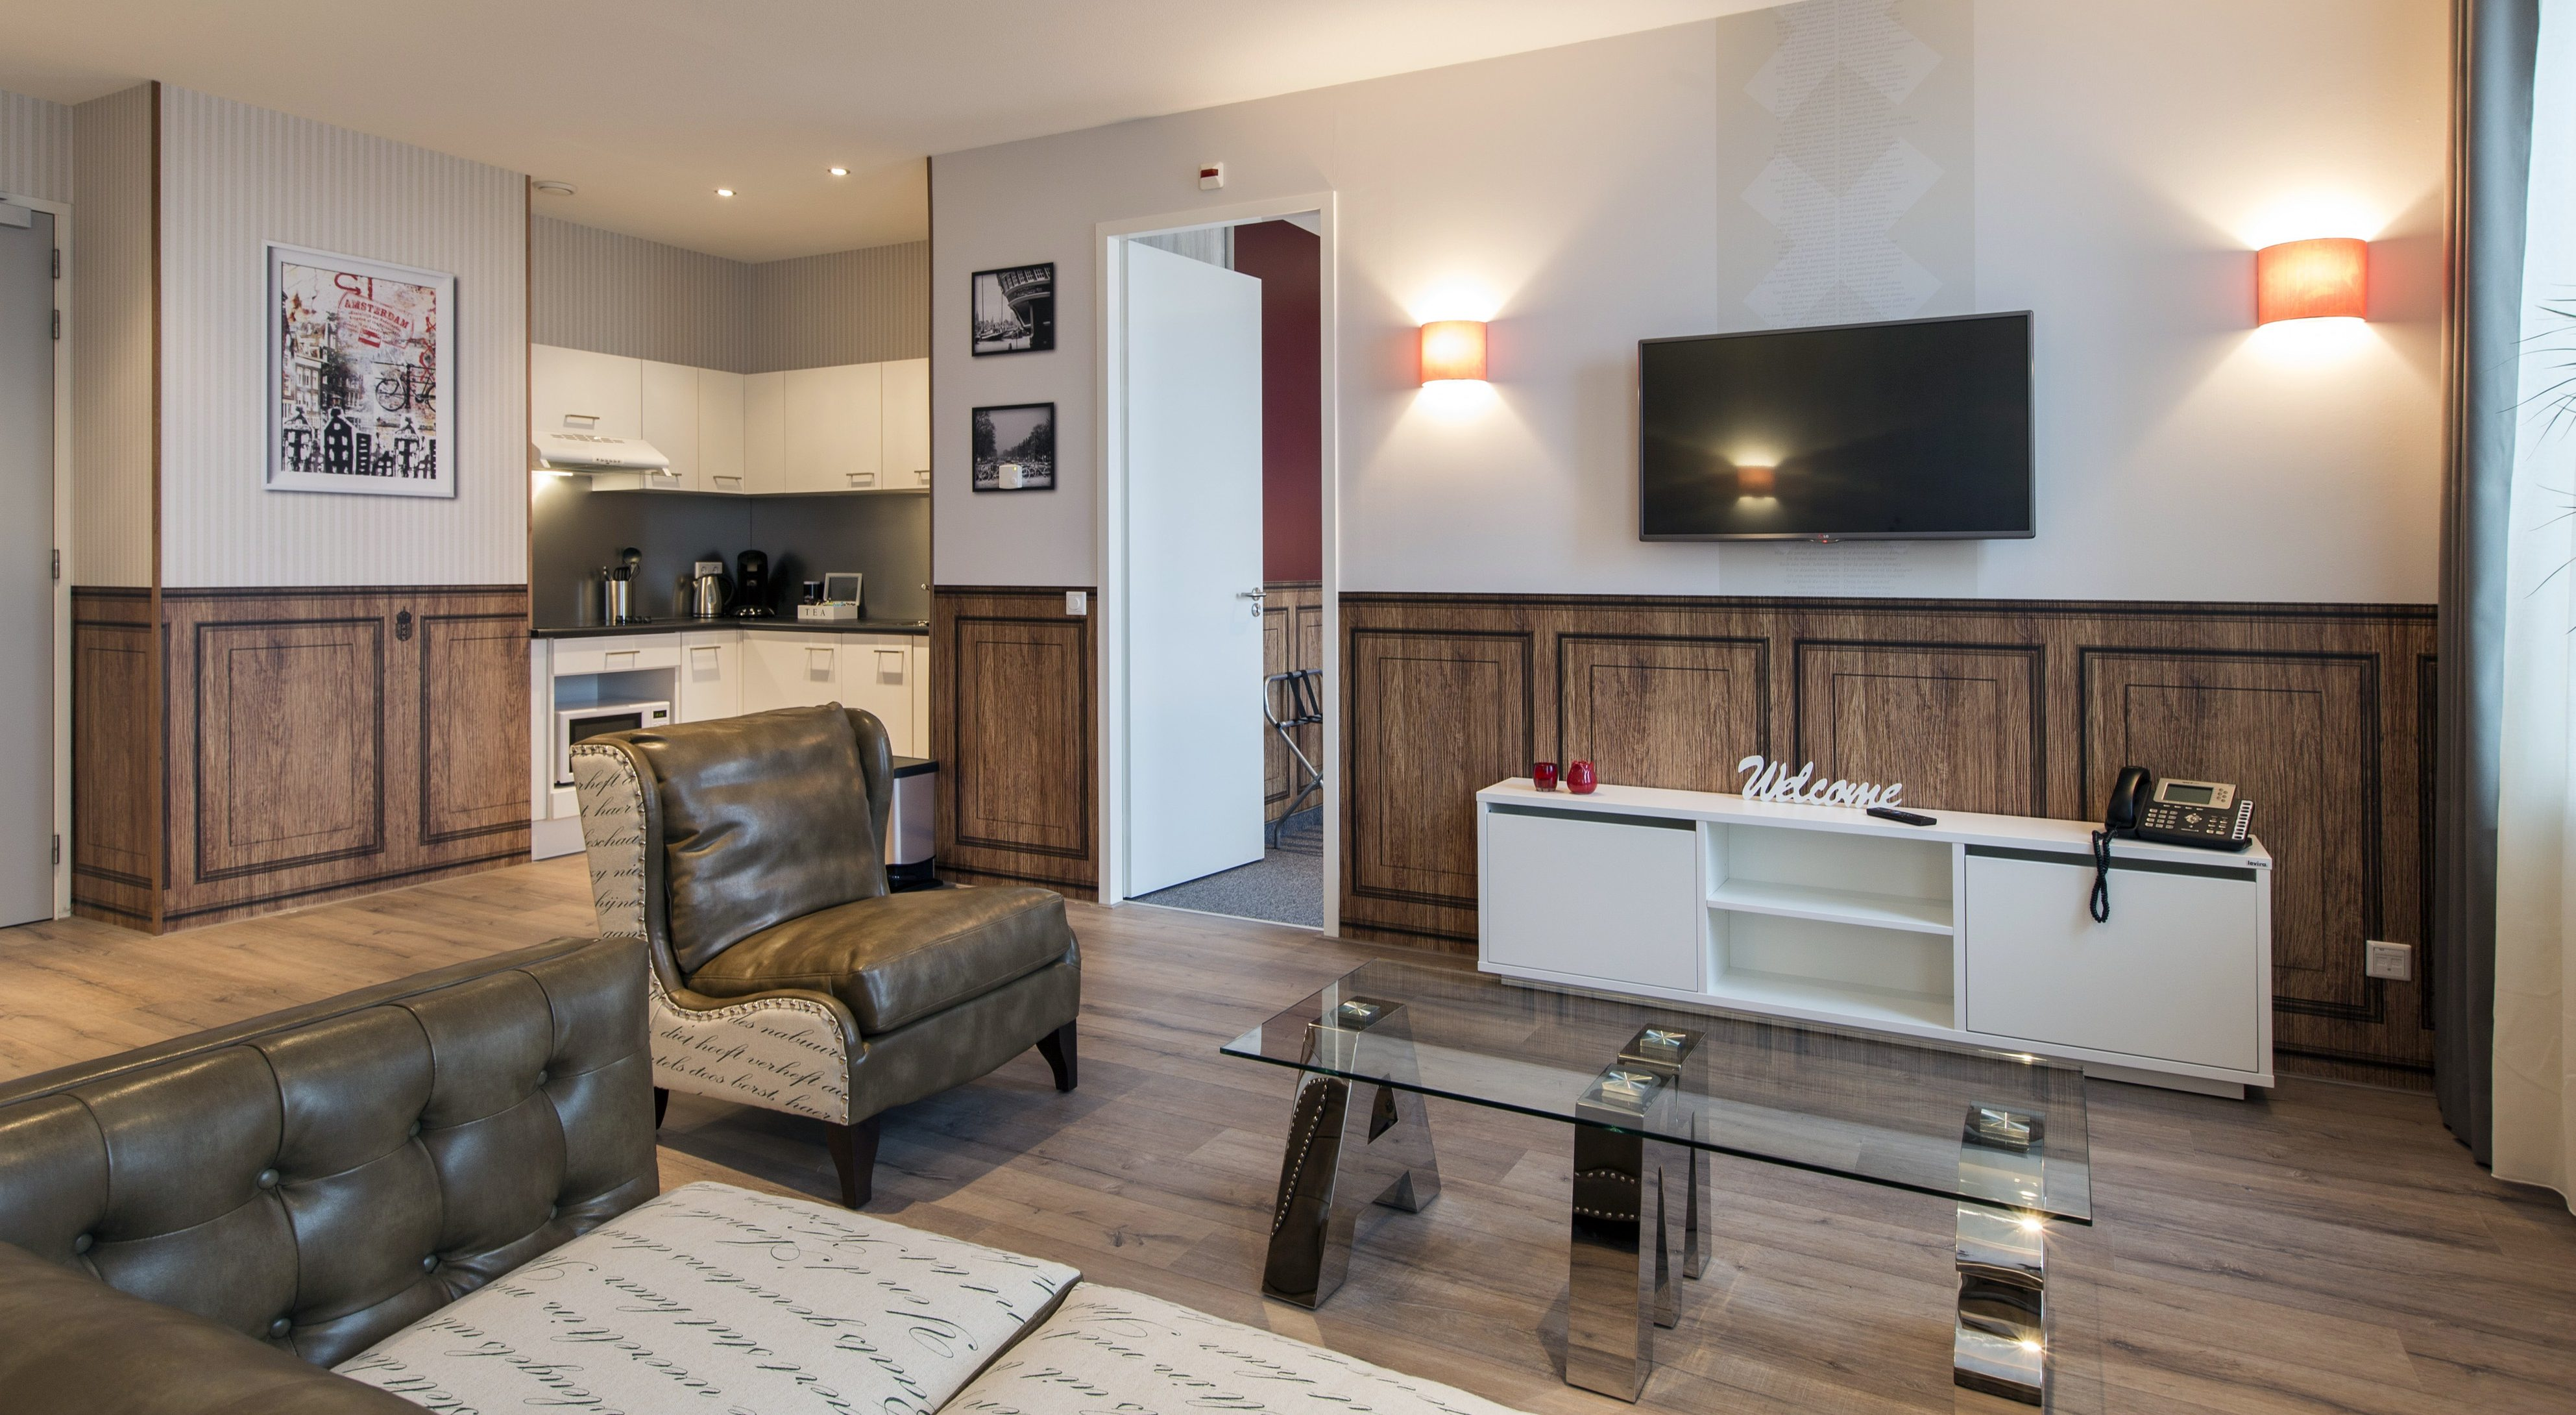 Amsterdam id aparthotel kiest voor ew facility services for Aparthotel amsterdam